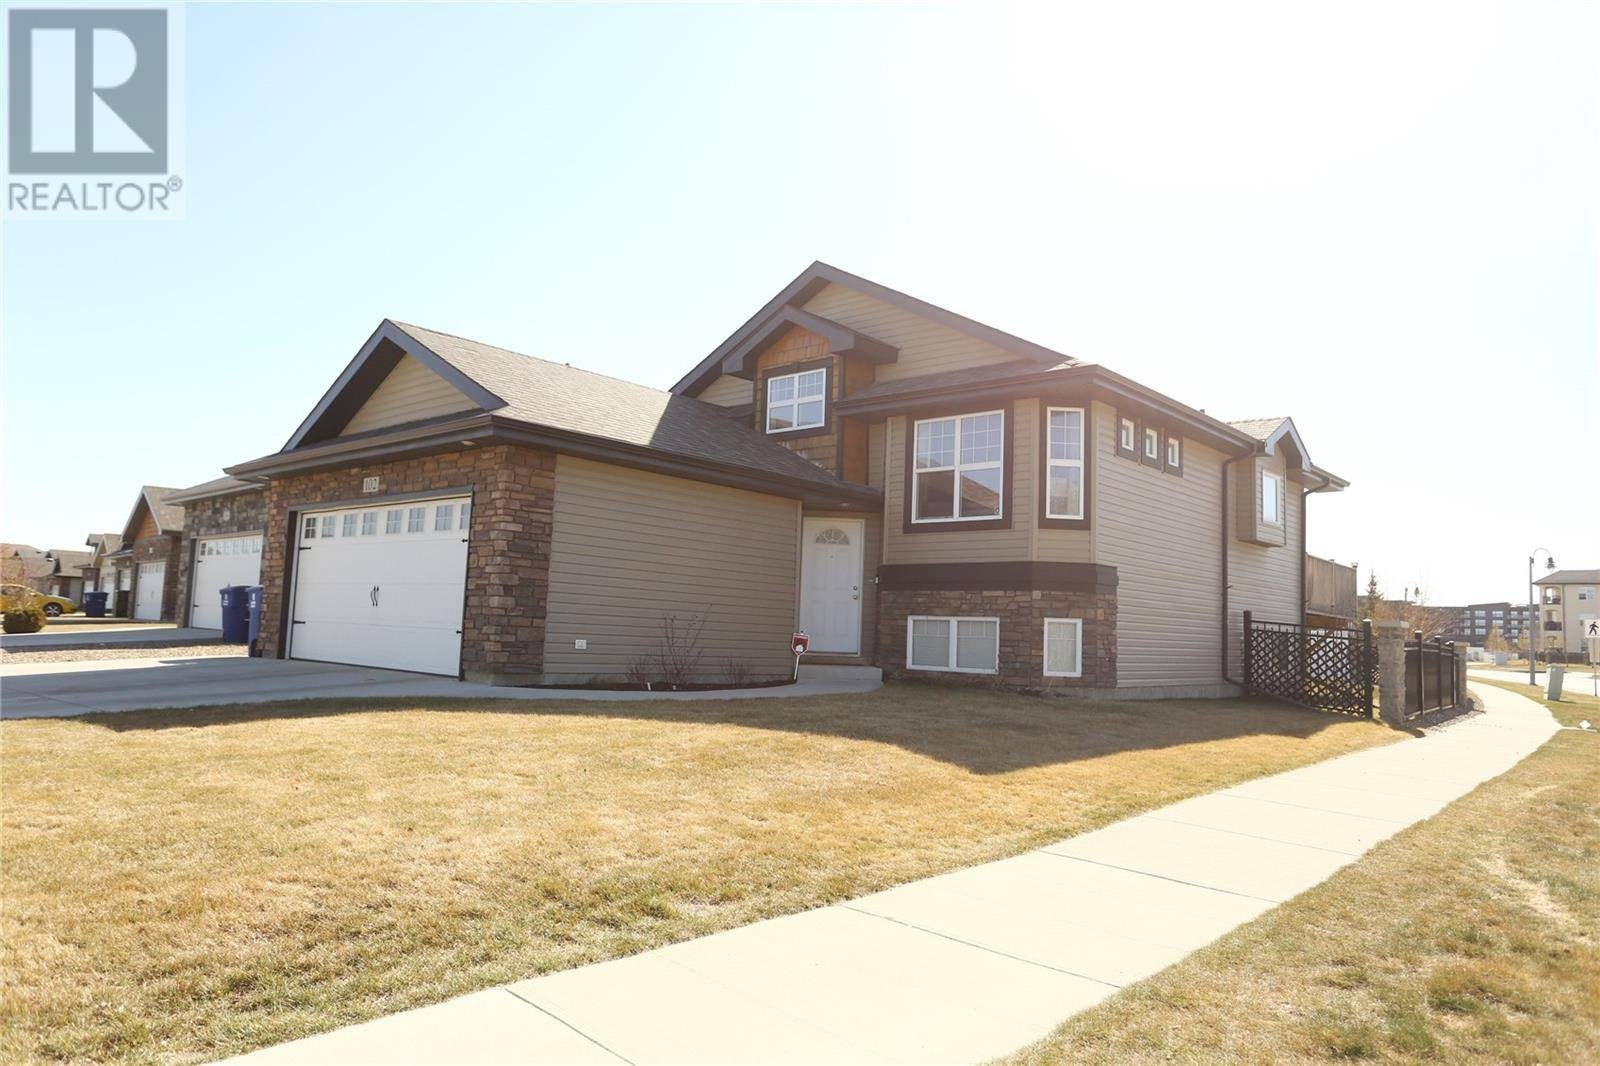 House for sale at 102 Whalley Cres Saskatoon Saskatchewan - MLS: SK781301